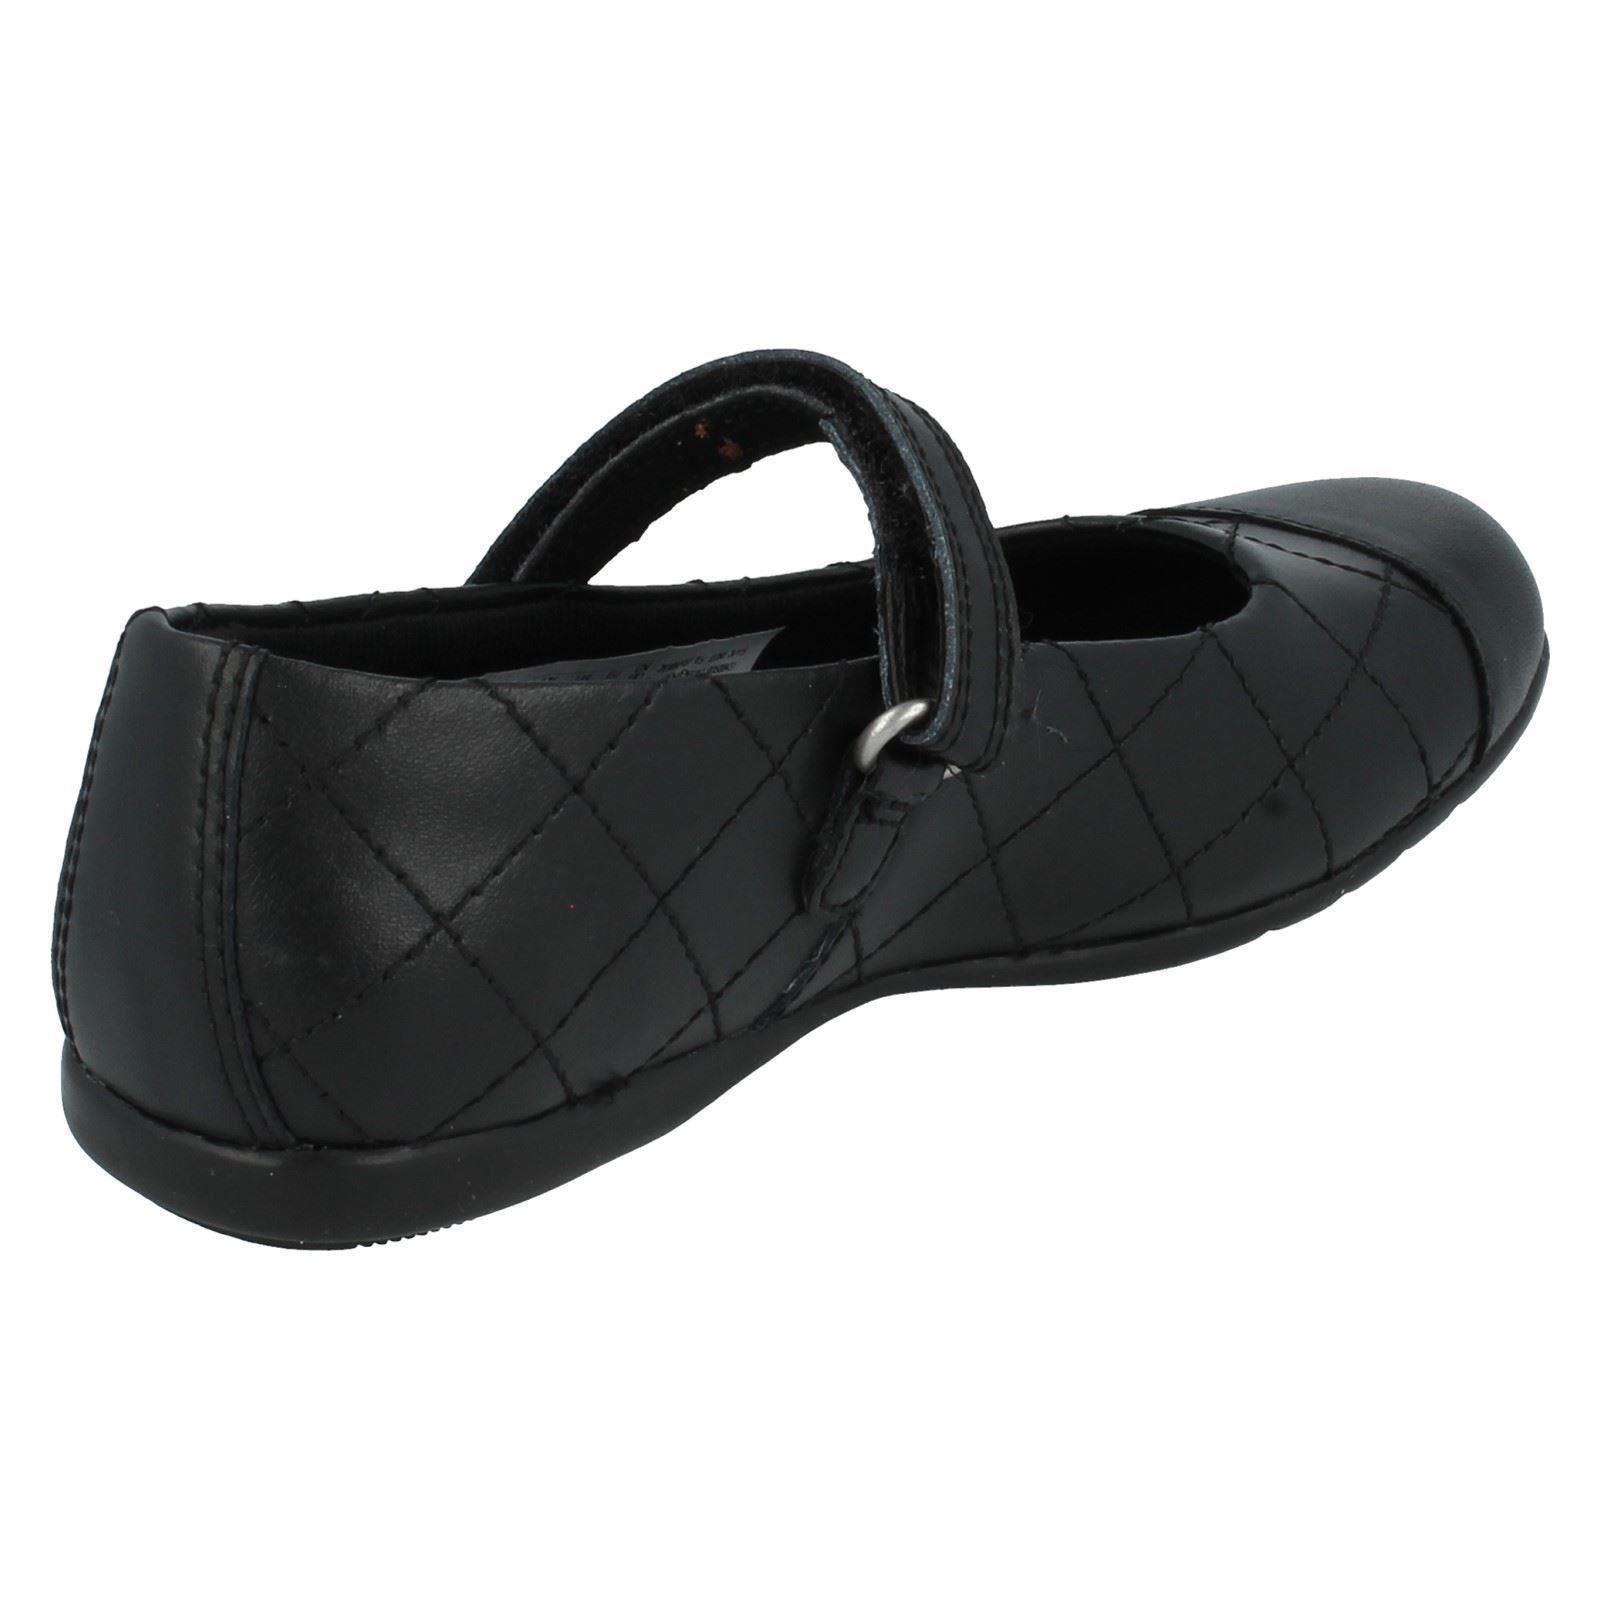 Girls Clarks Shoes Dance Roxy